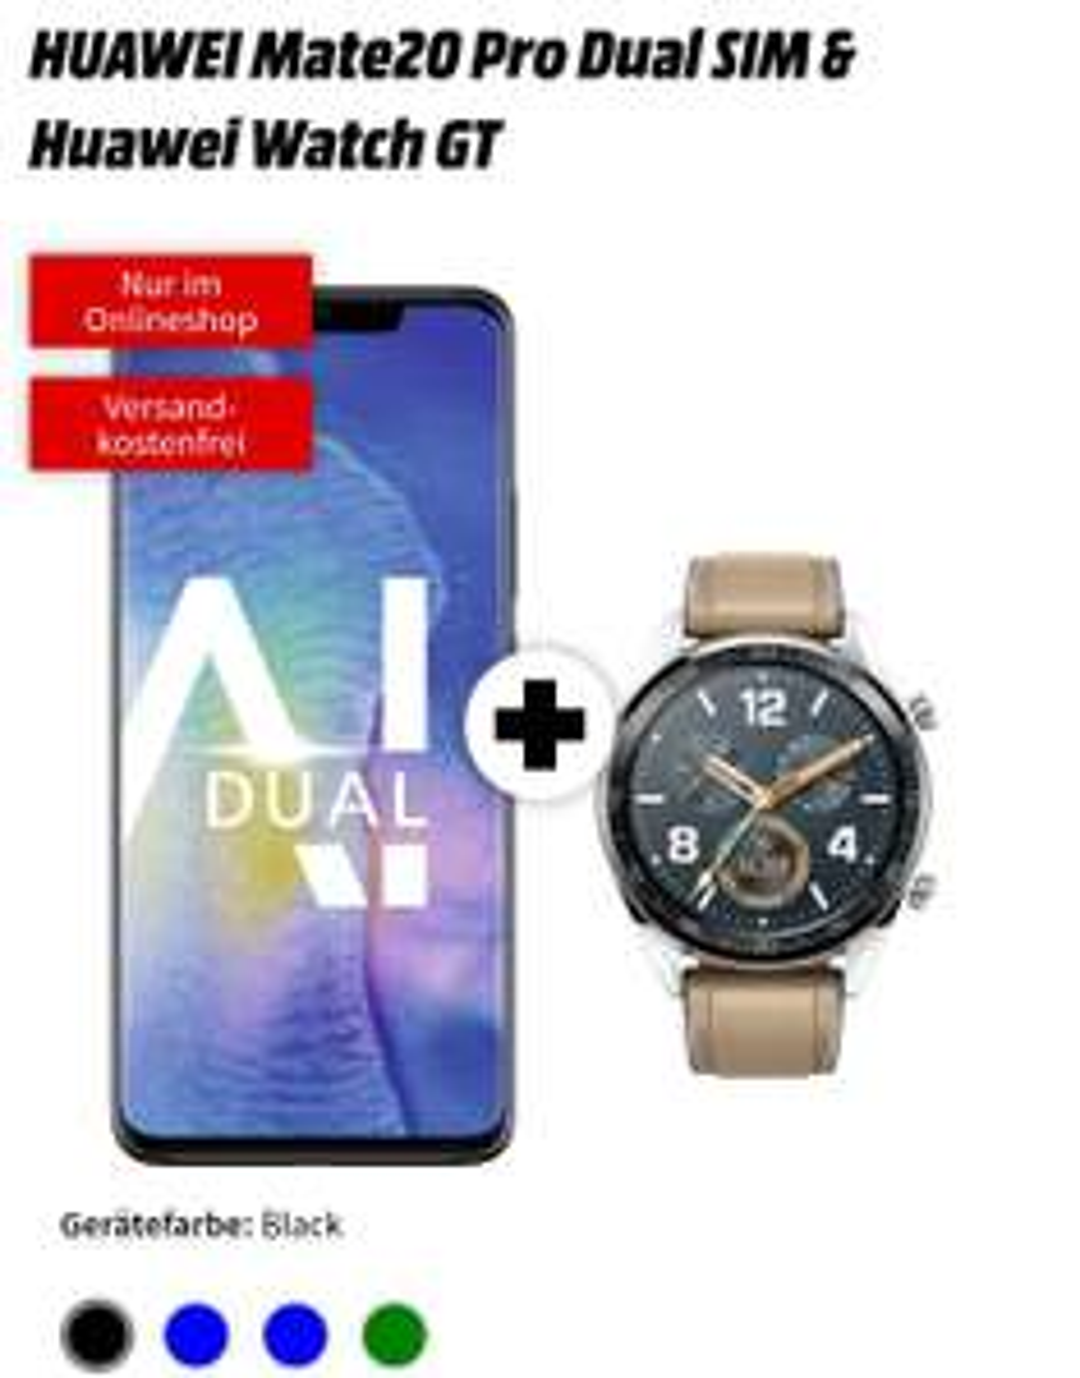 Huawei Mate 20 pro dual sim + Huawei Watch GT mit MD Vodafone 4gb LTE (monatlich 31,99)